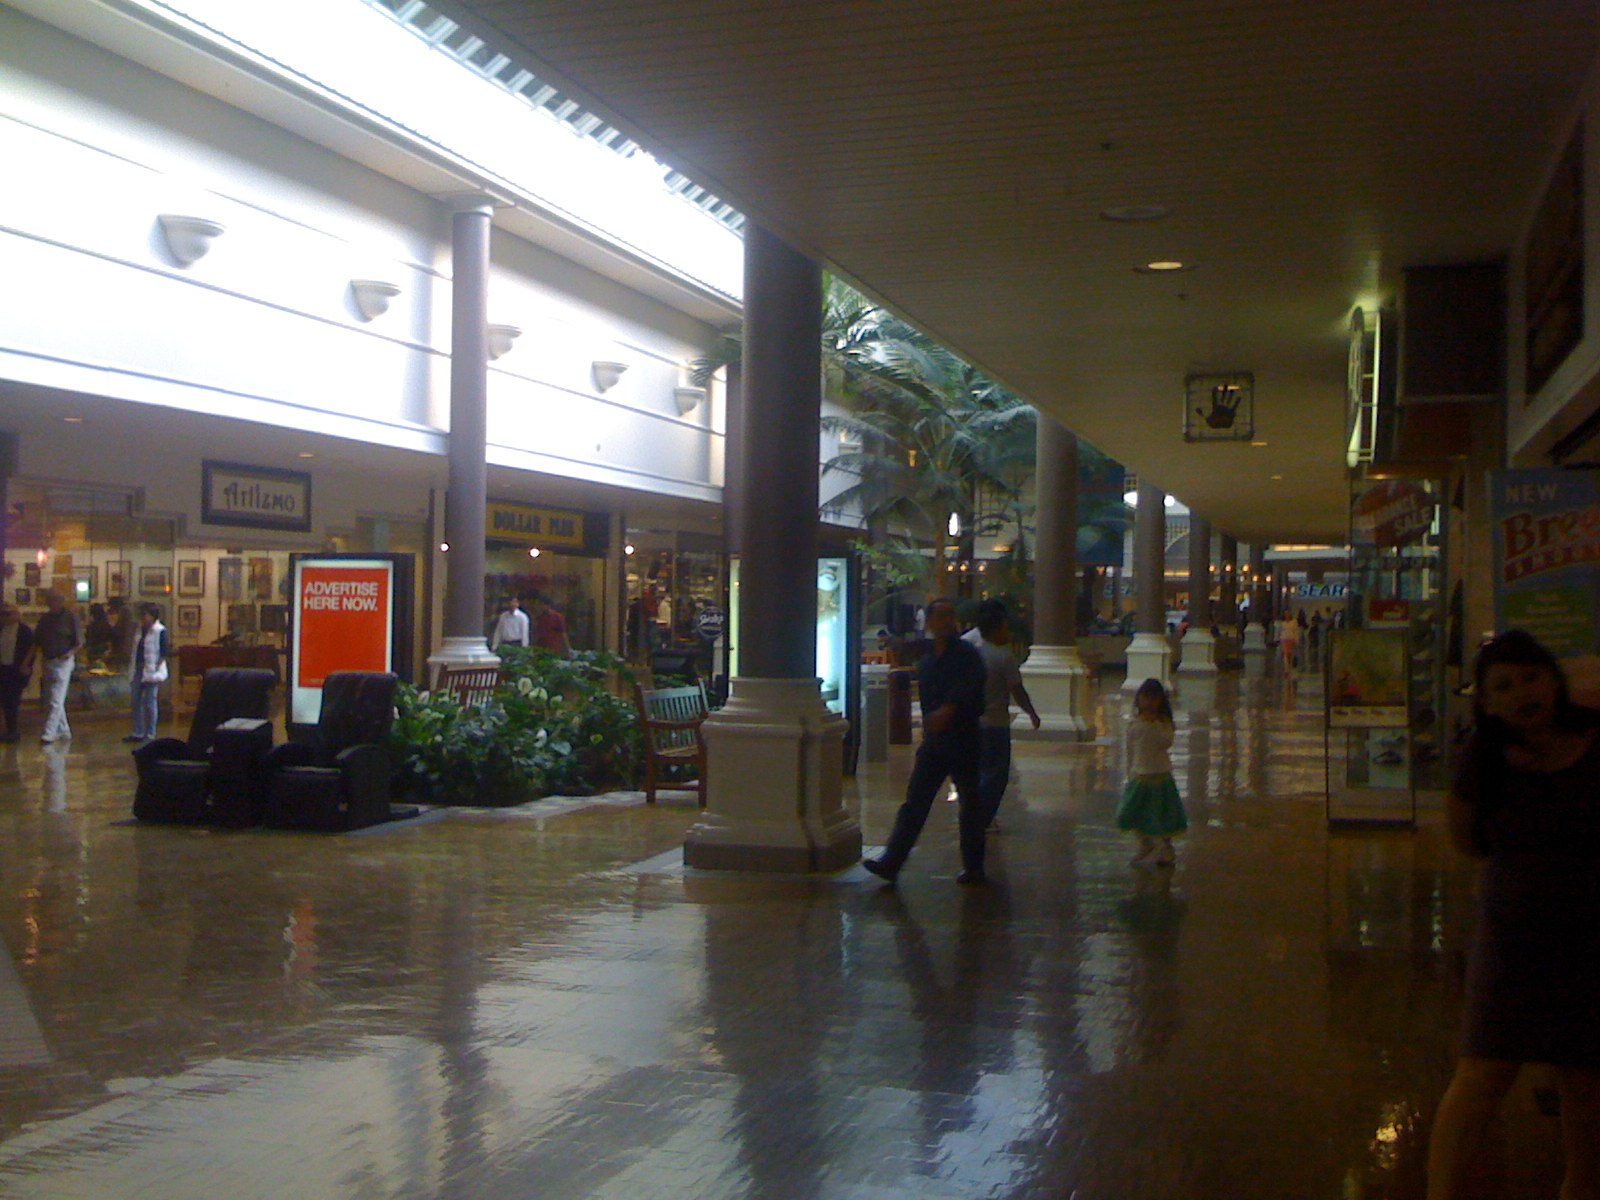 Jun 11, · Applebee's Northgate Mall, San Rafael: See 13 unbiased reviews of Applebee's Northgate Mall, rated 3 of 5 on TripAdvisor and ranked # of restaurants in San Rafael.3/5(13).